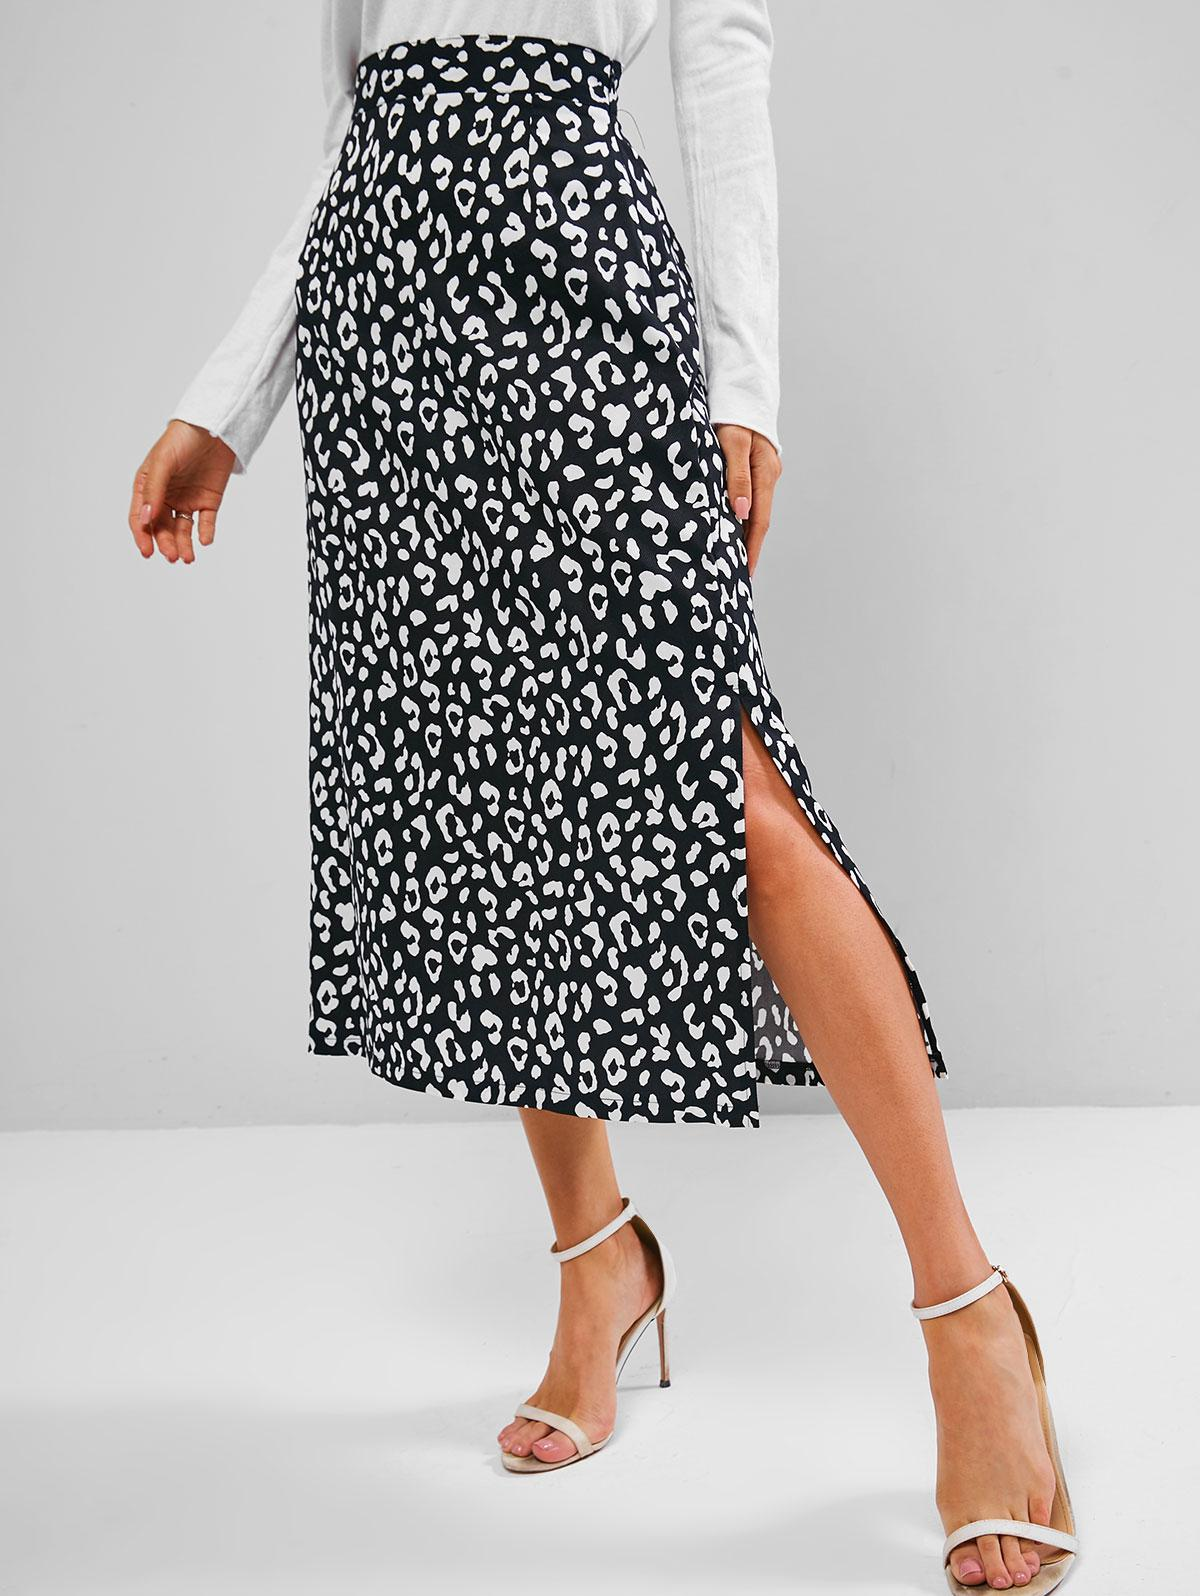 Leopard Animal Print Slit A Line Skirt